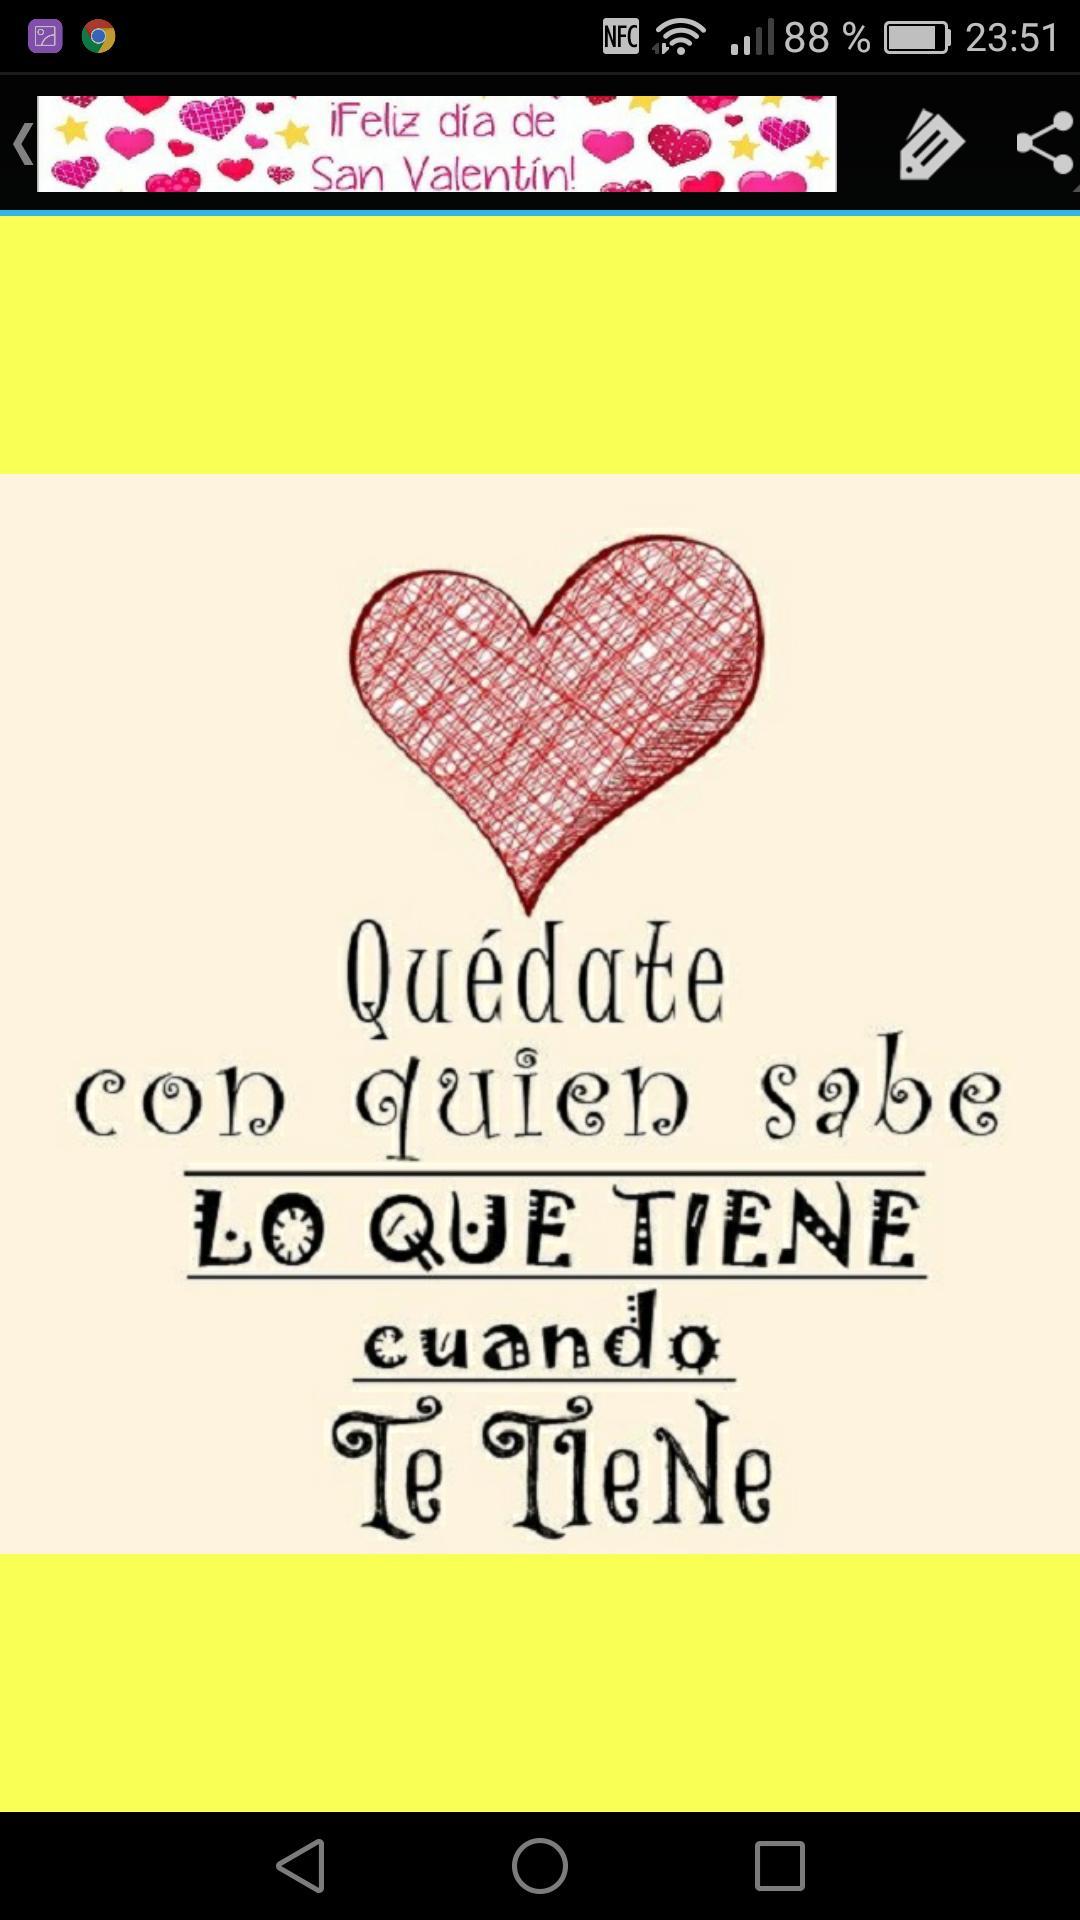 Frases Bonitas De San Valentin For Android Apk Download